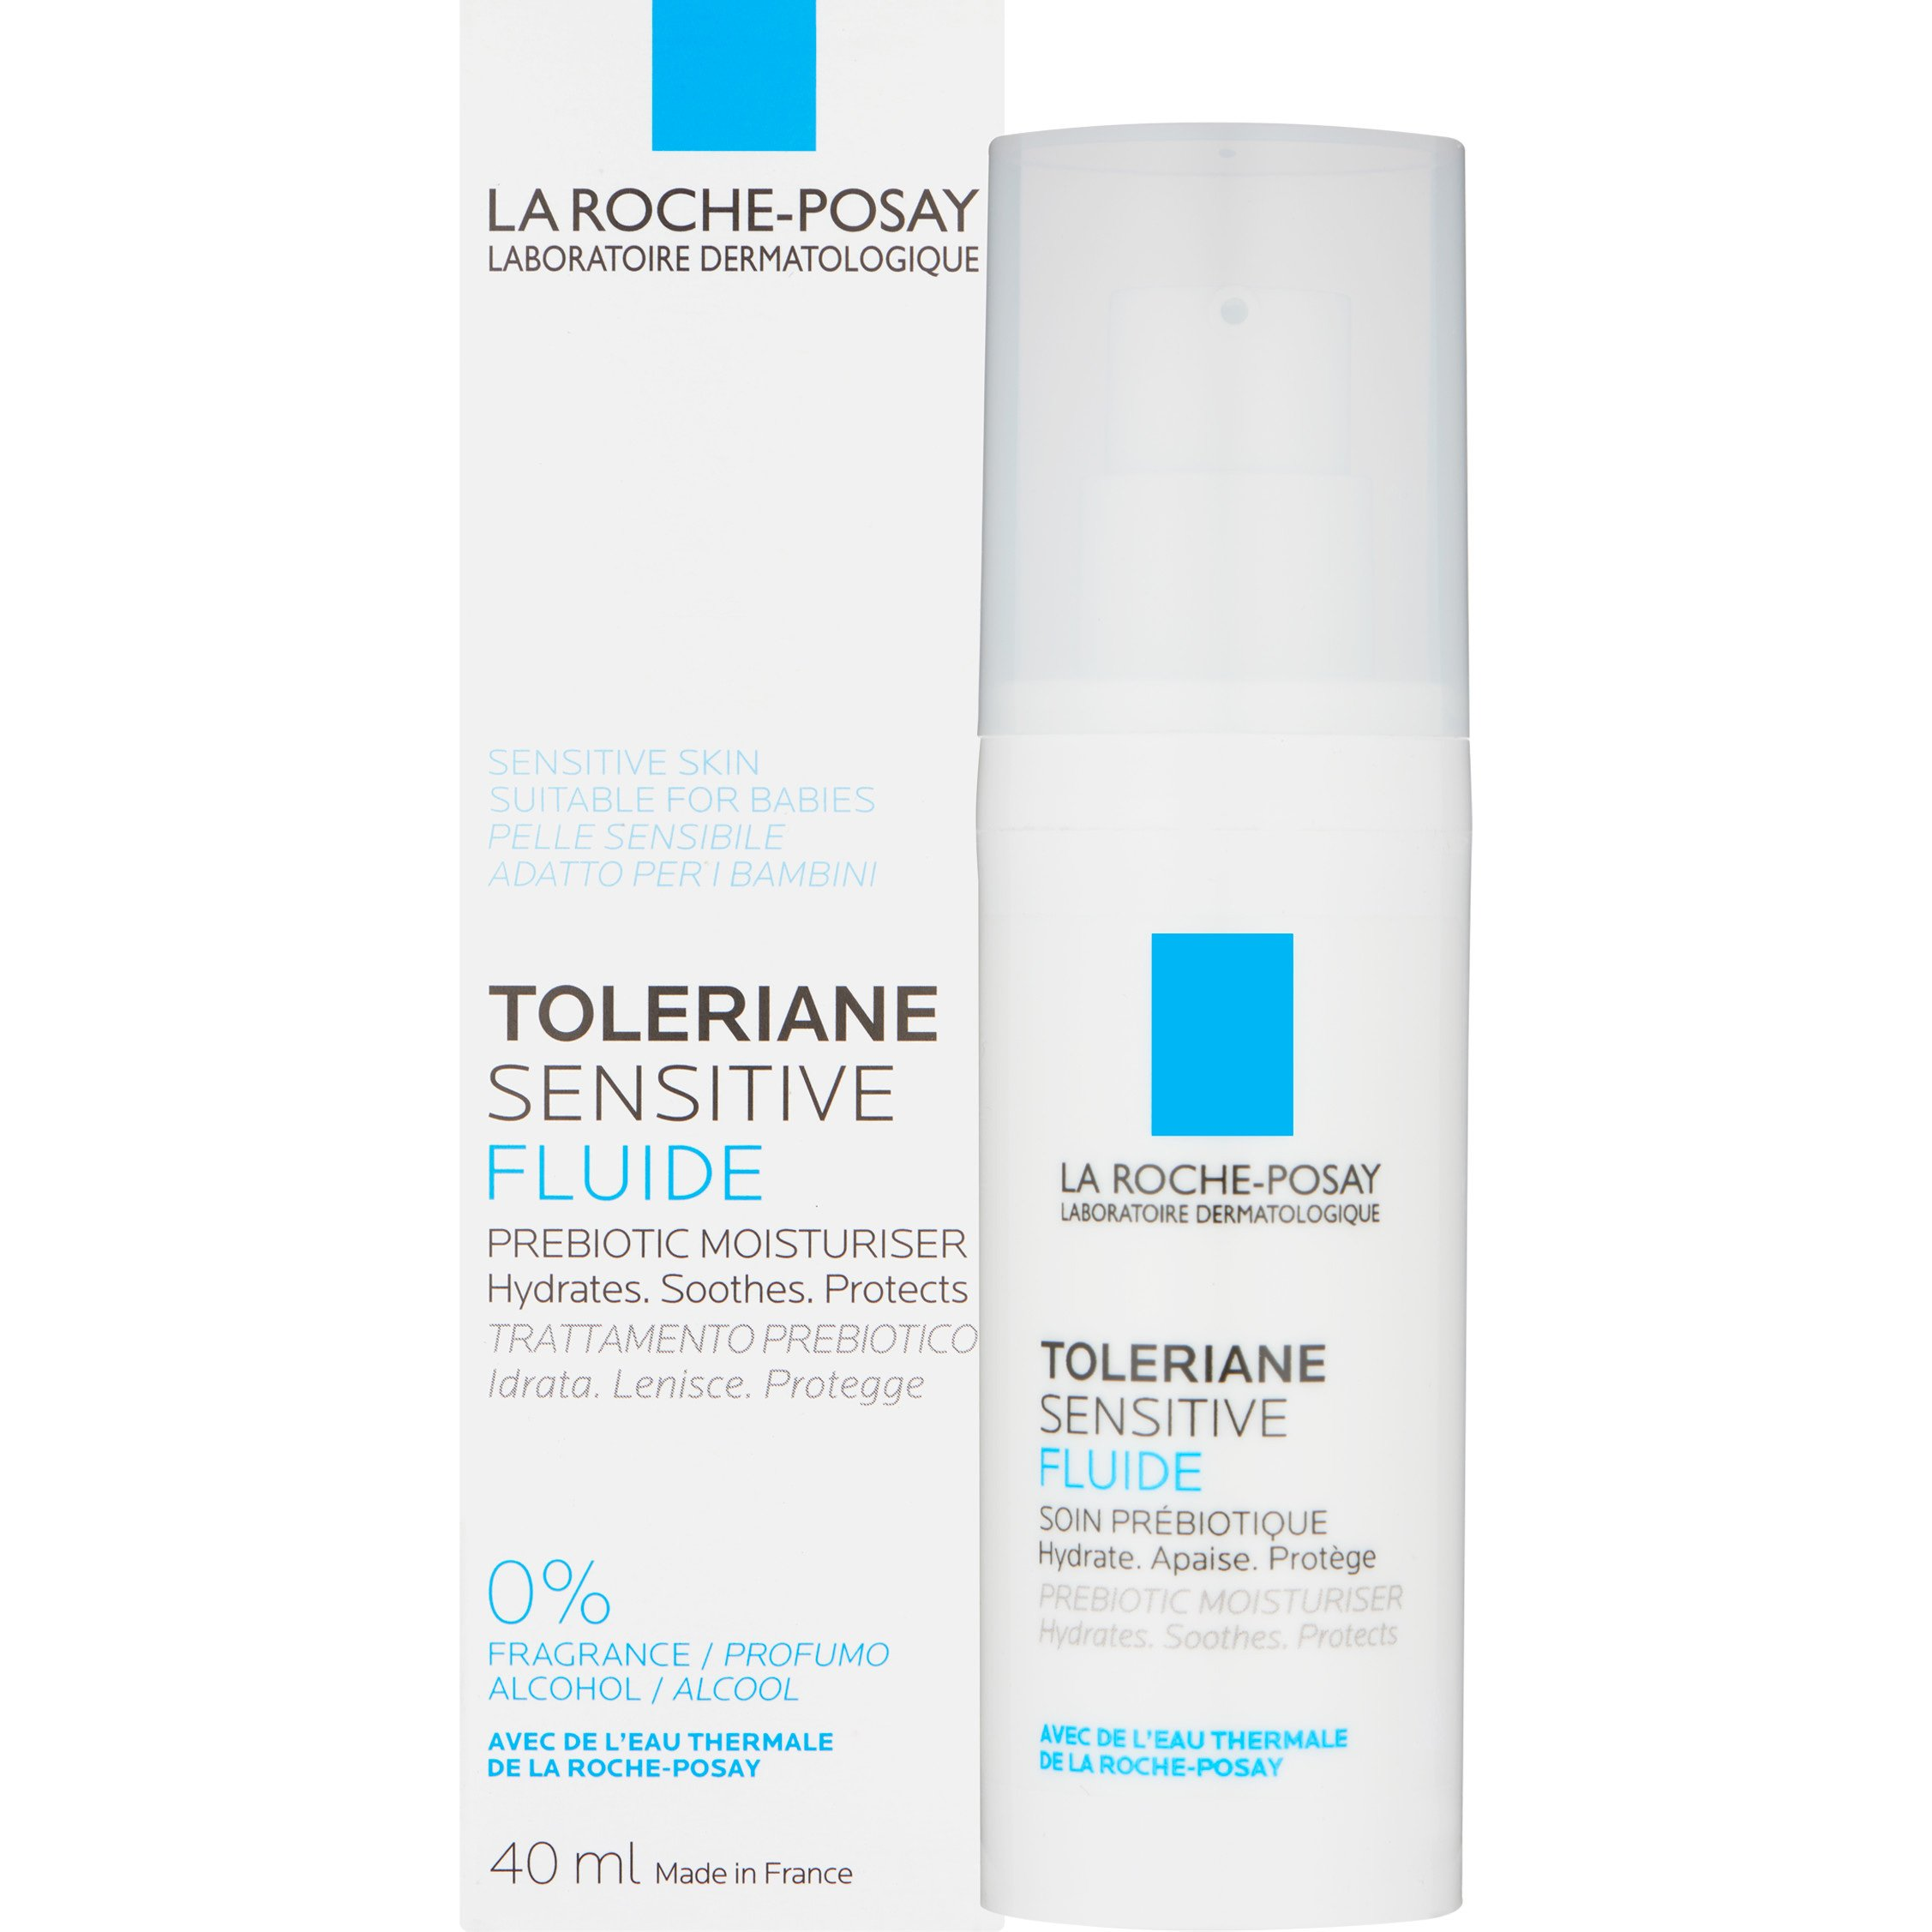 La Roche-Posay Toleriane Sensitive FluideΛεπτόρρευστη Ενυδατική Κρέμα Προσώπου με Πρεβιοτικά 40ml